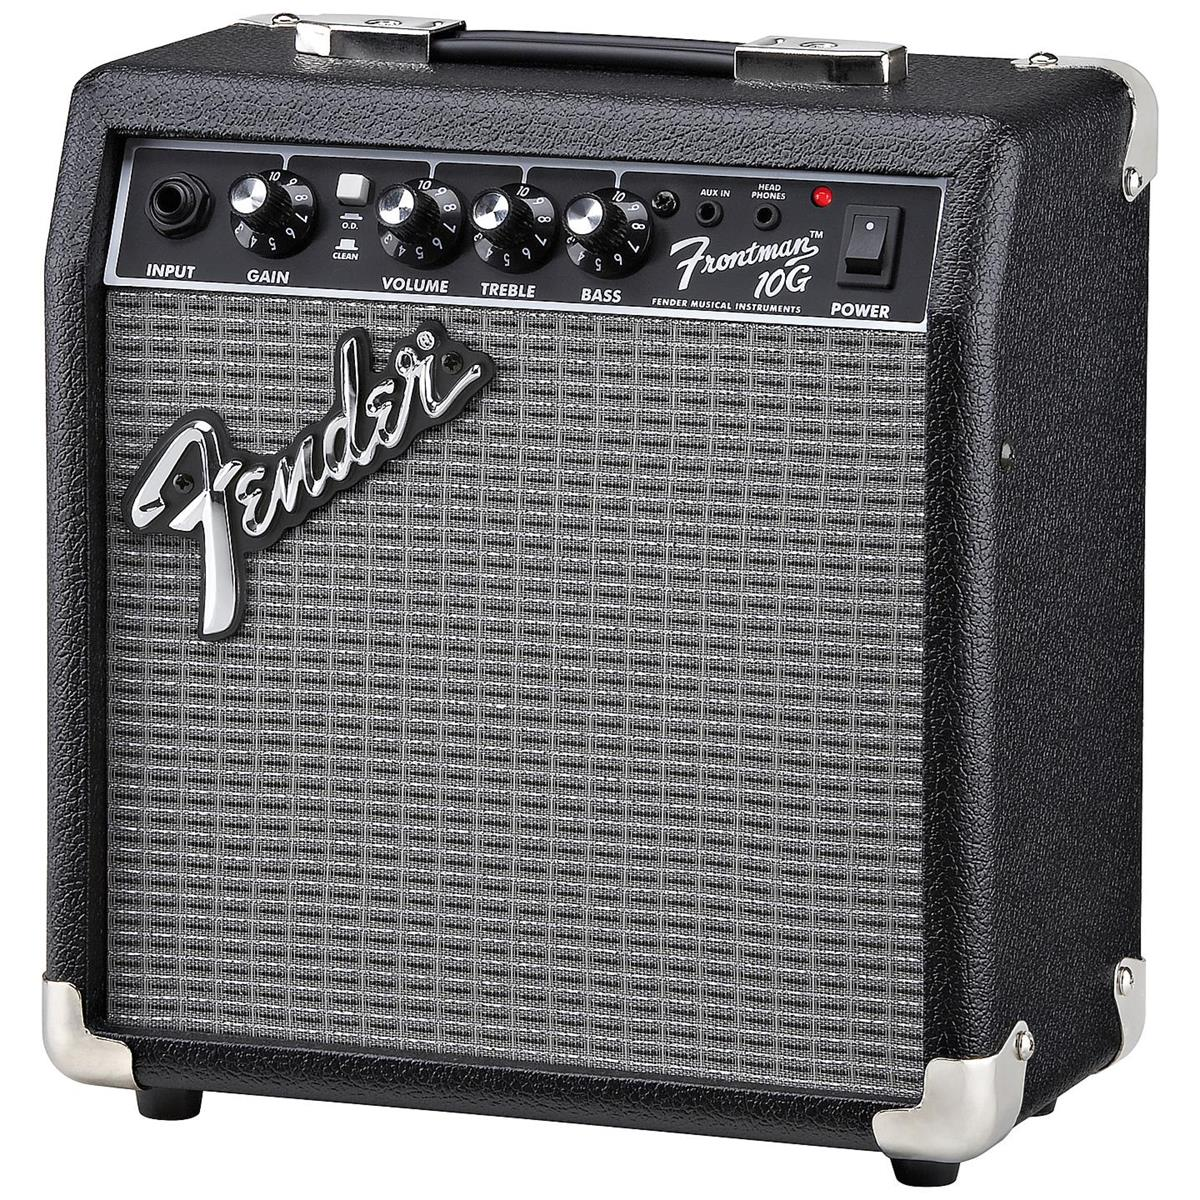 FENDER AMP FRONTMAN 10G - 2311006900